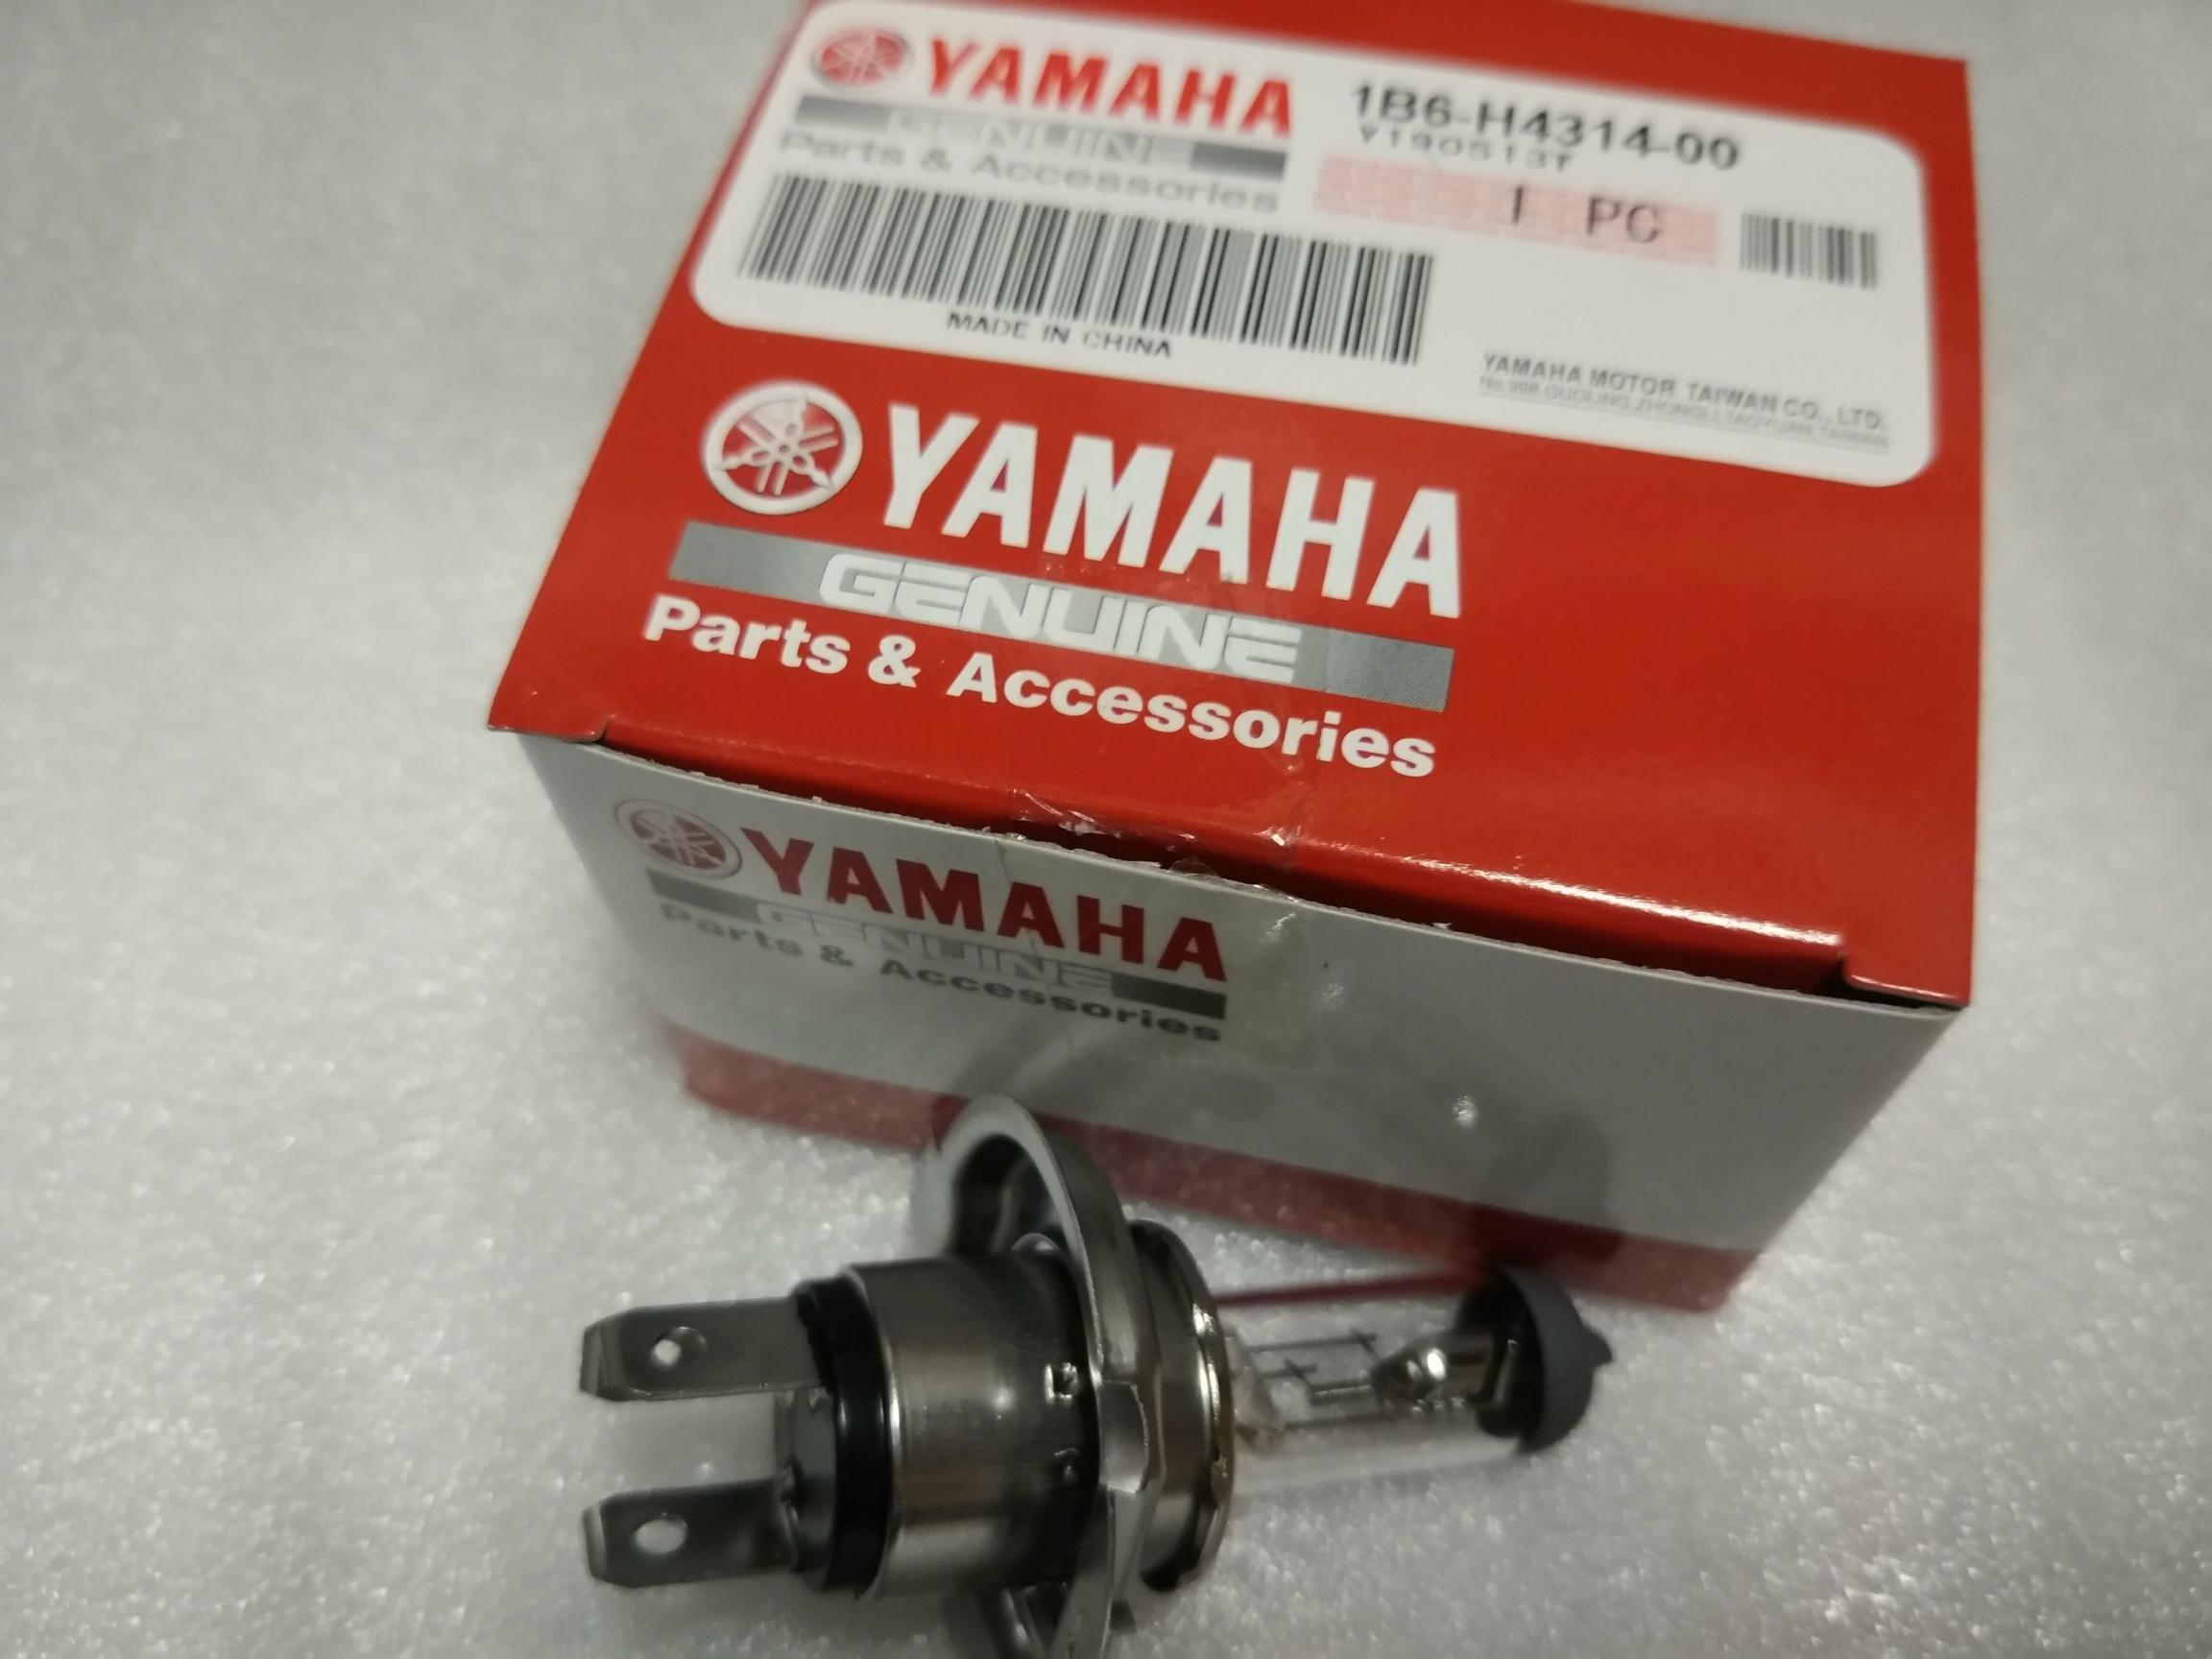 YAMAHA 山葉 原廠 勁風光 勁戰 二代 三代 四代 GTR AERO 新 GTR SMAX 一代 大燈 燈泡